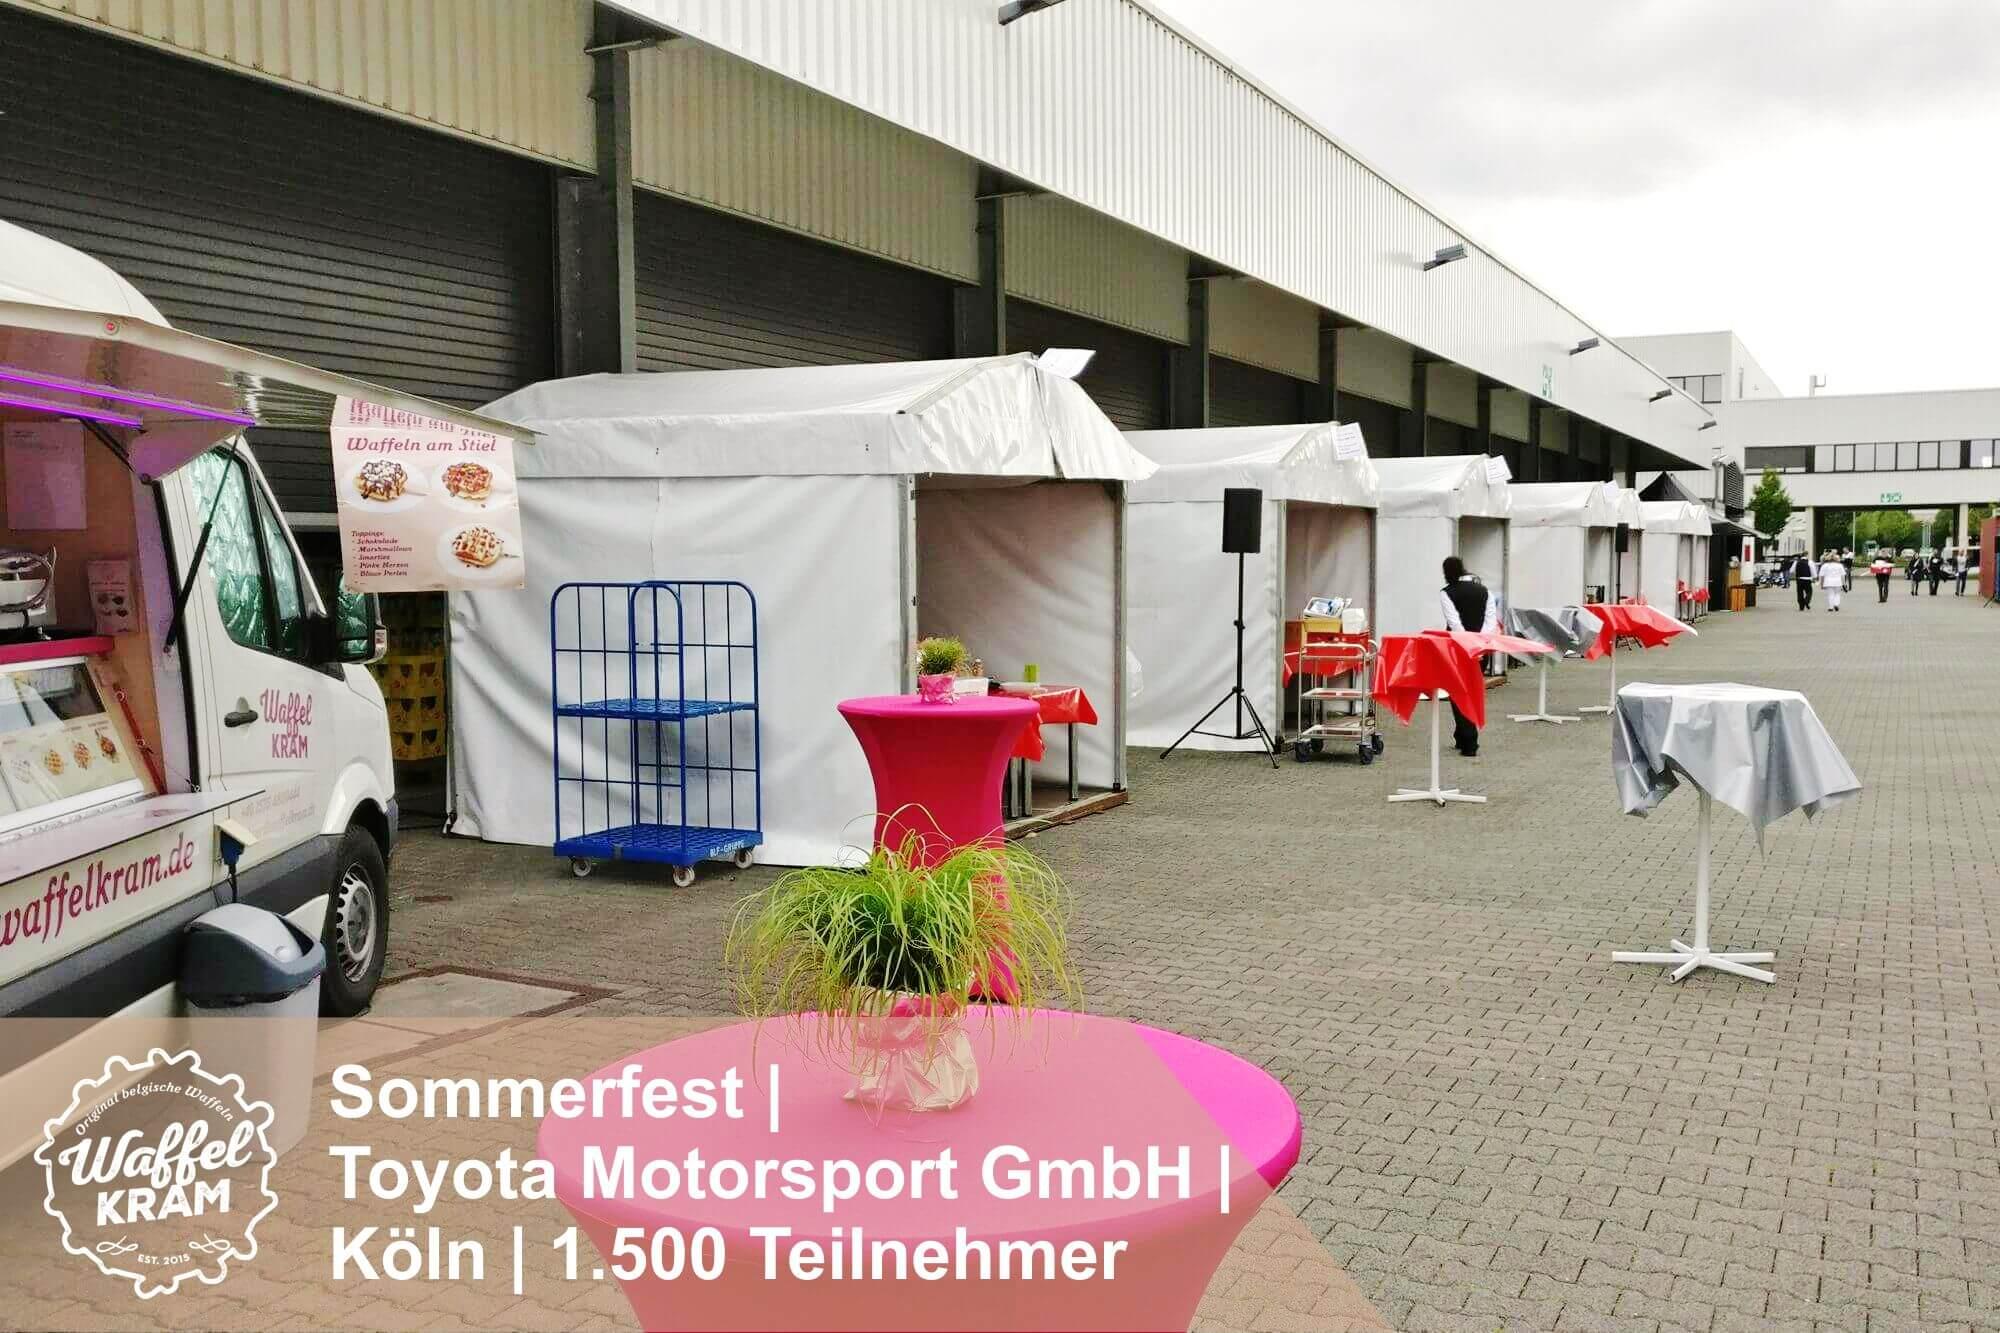 catering-sommerfest-toyota-motorsport-koeln-2-tx